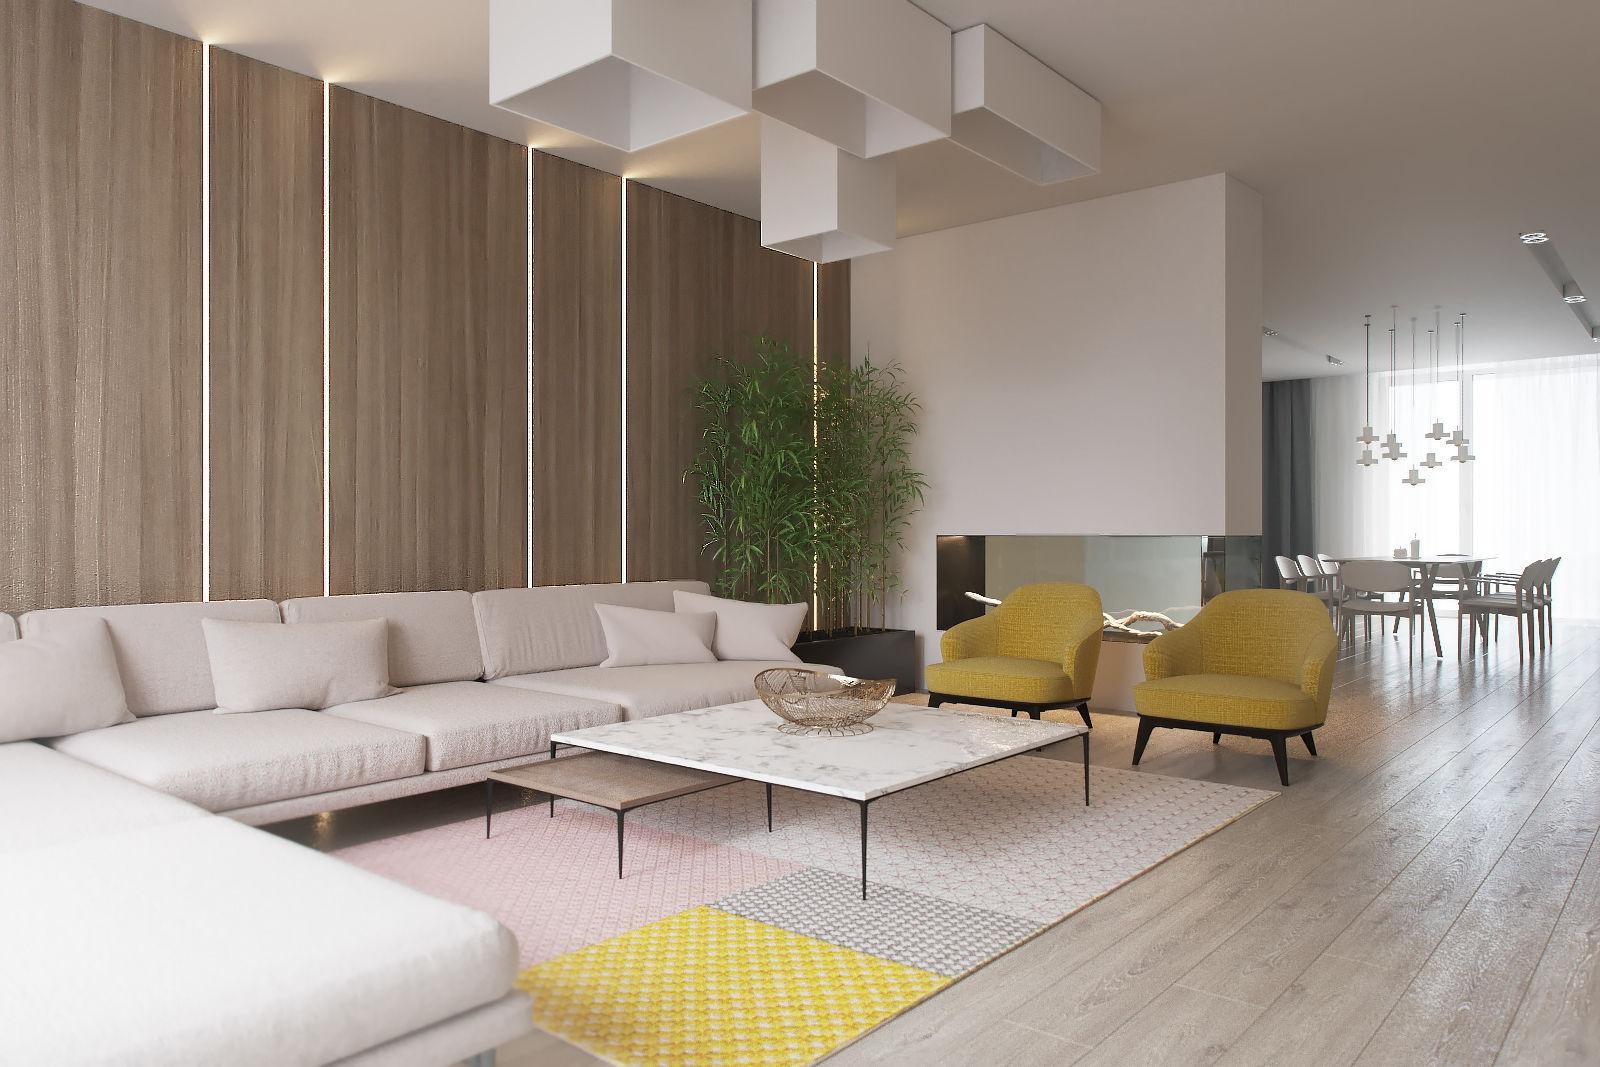 Nette Mannen Woonkamer : Scheidingswand tussen woonkamer en eetkamer interieur inrichting